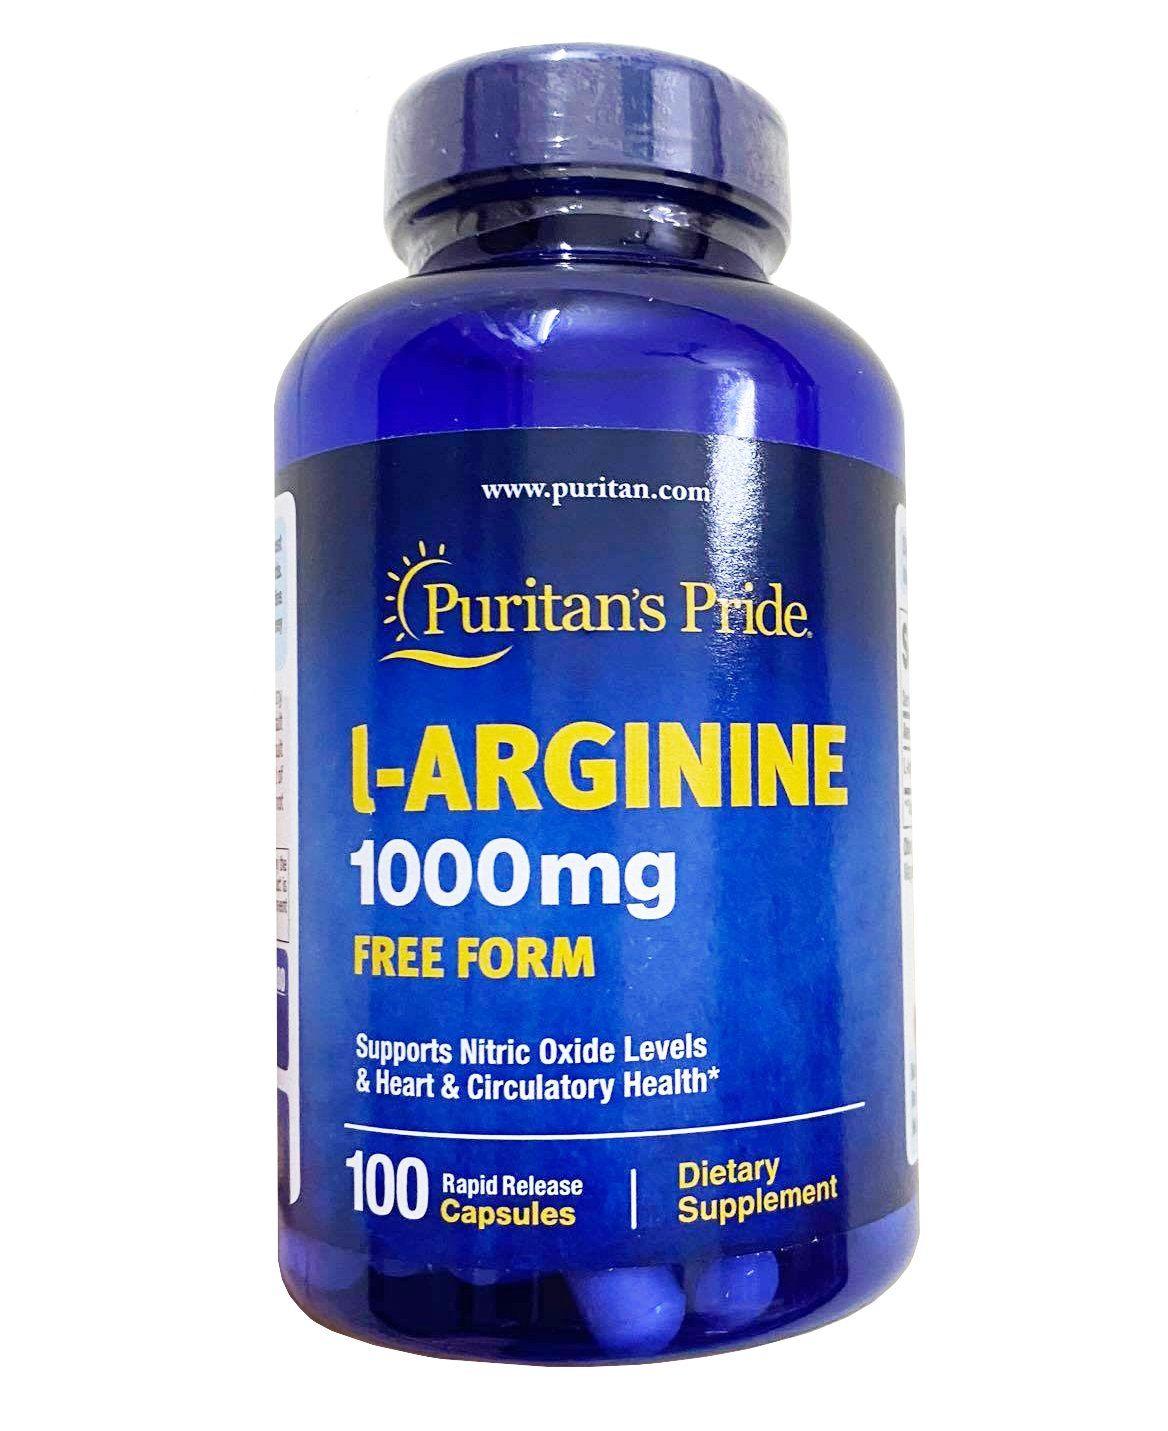 Viên Uống Puritan's Pride L-Arginine 1000mg Của Mỹ